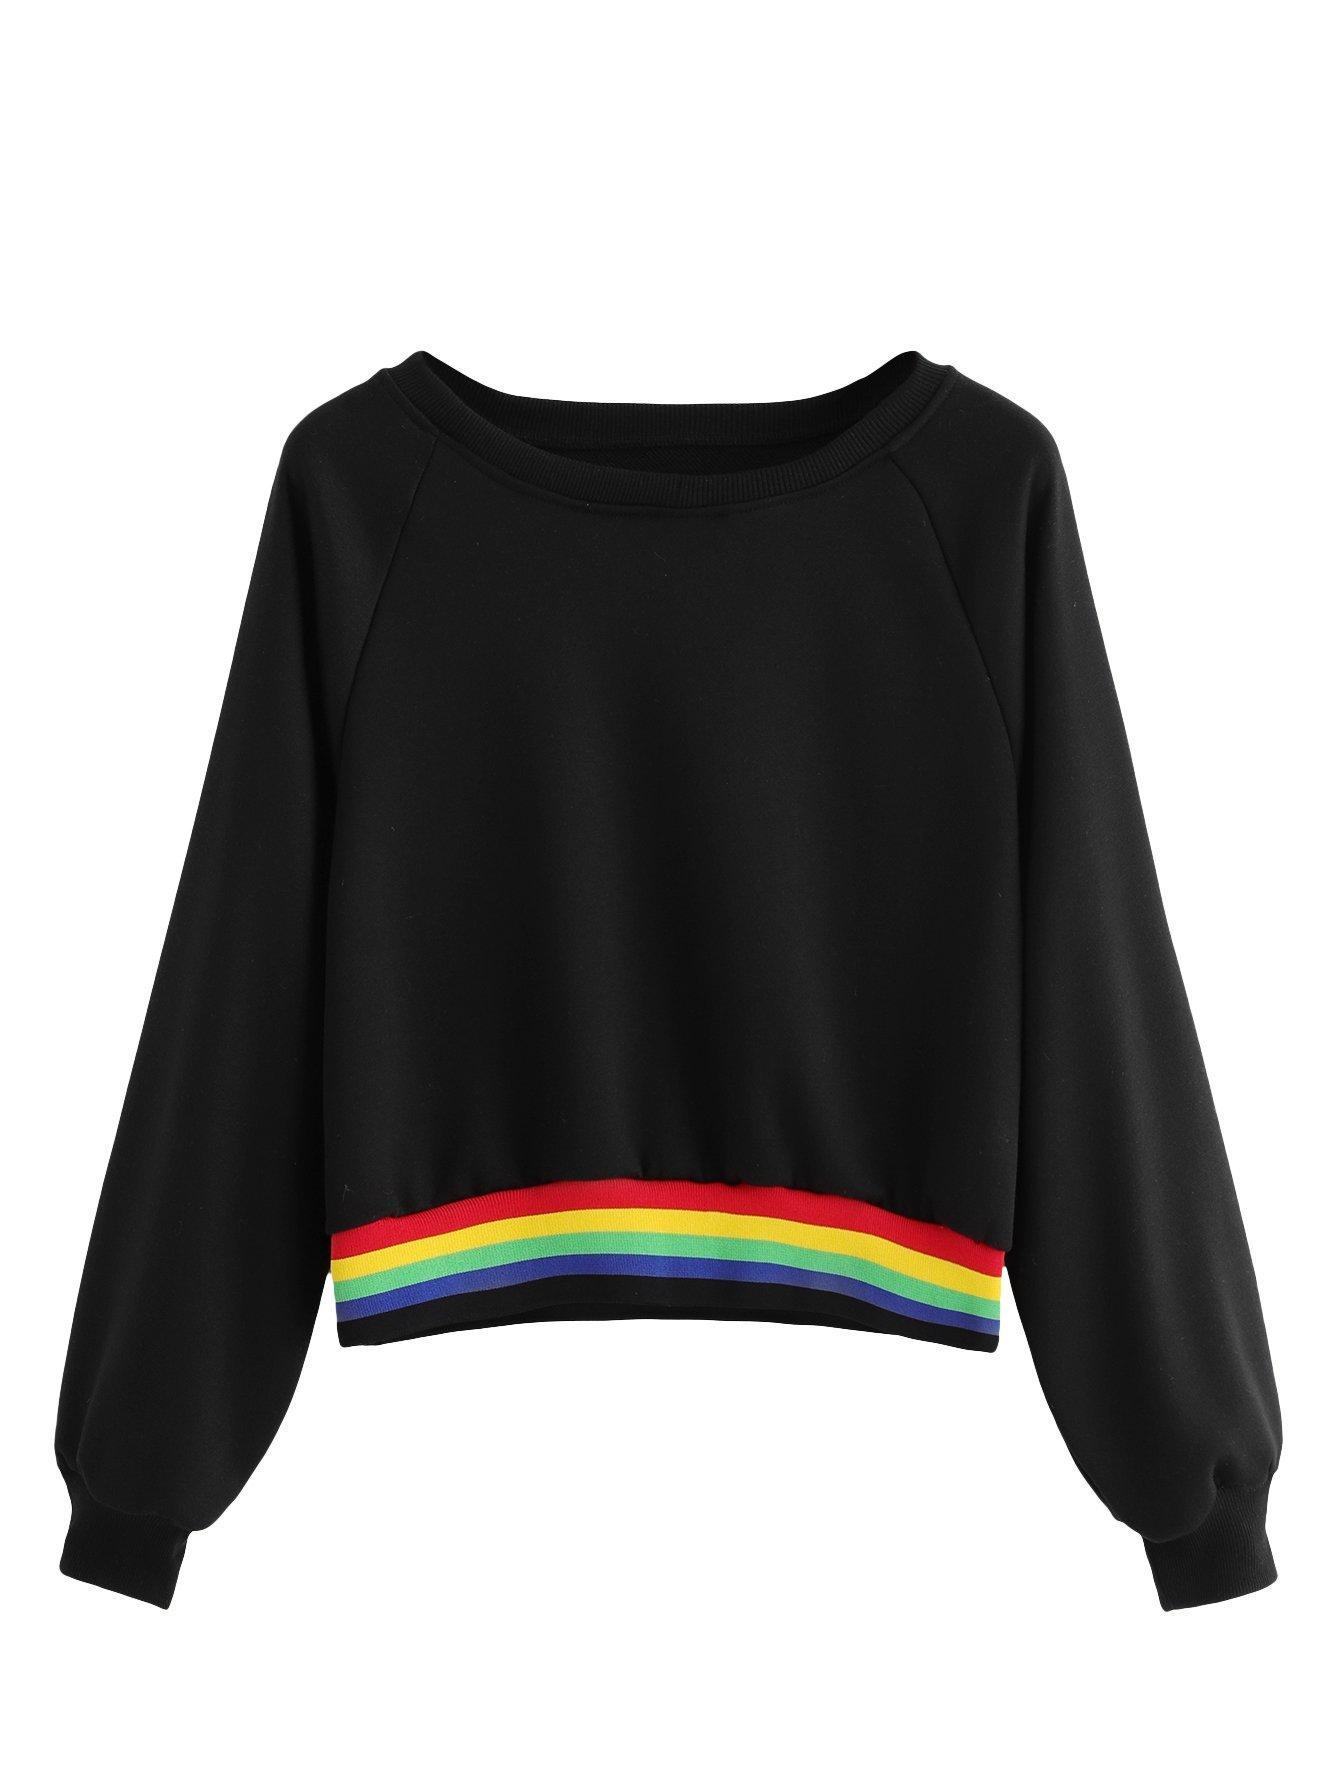 SheIn Women's Raglan Sleeve Rainbow Striped Colorblock Crewneck Crop Top Sweatshirt Black Medium